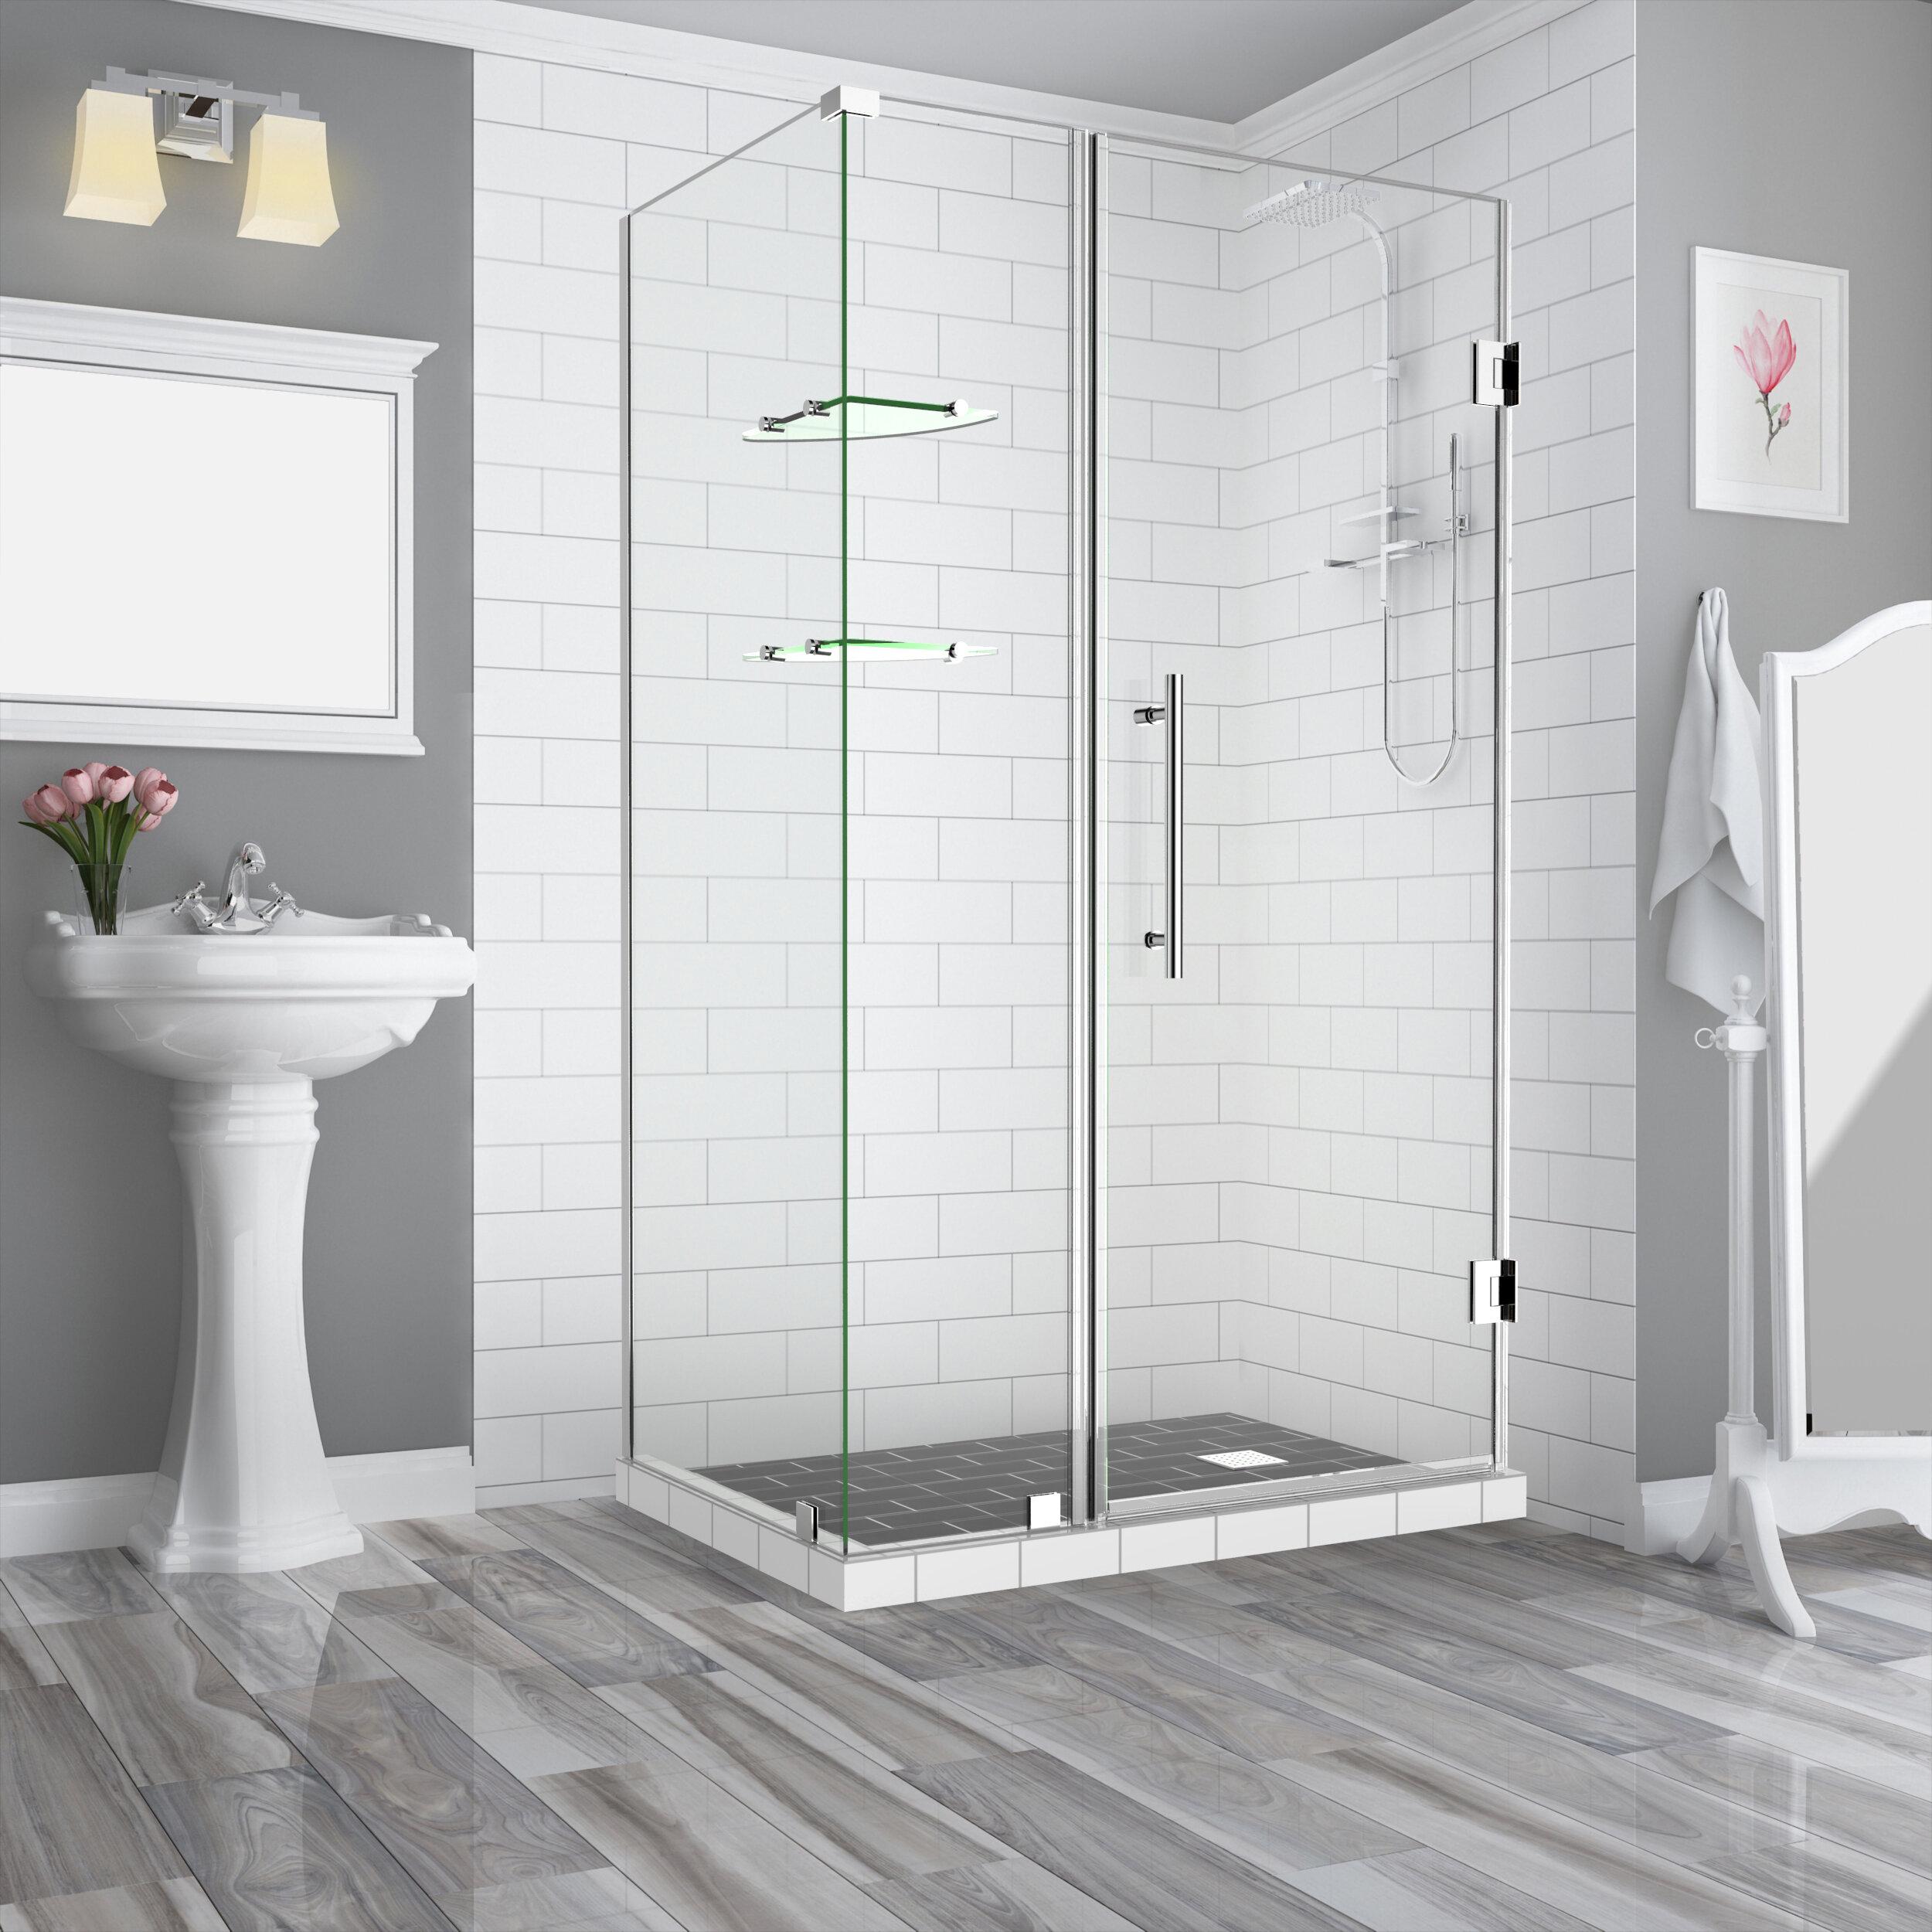 Aston Bromley Gs 75 63 X 72 Rectangle Hinged Shower Enclosure Wayfair